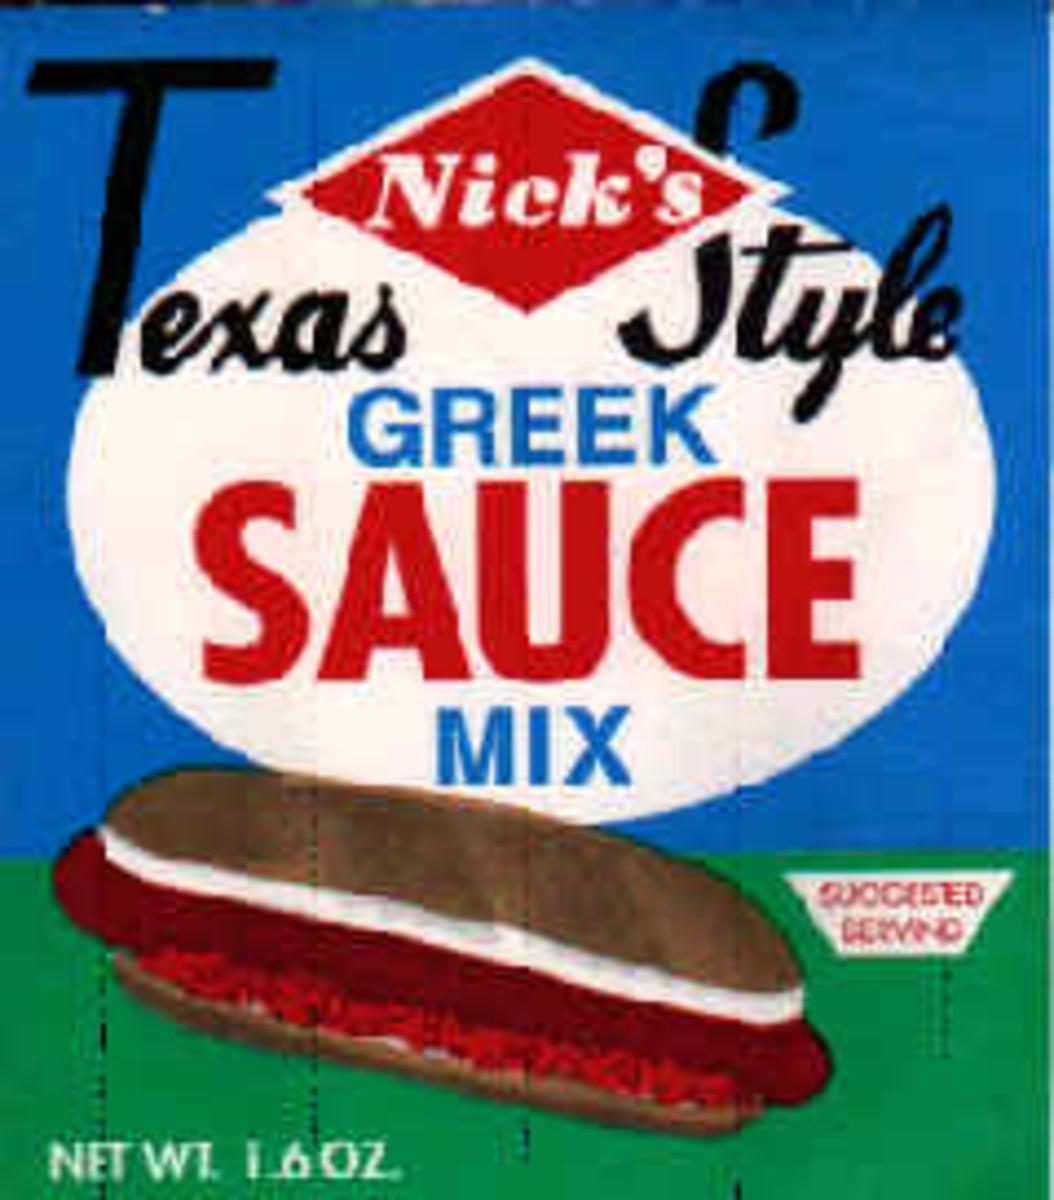 pennsylvania-greek-sauce